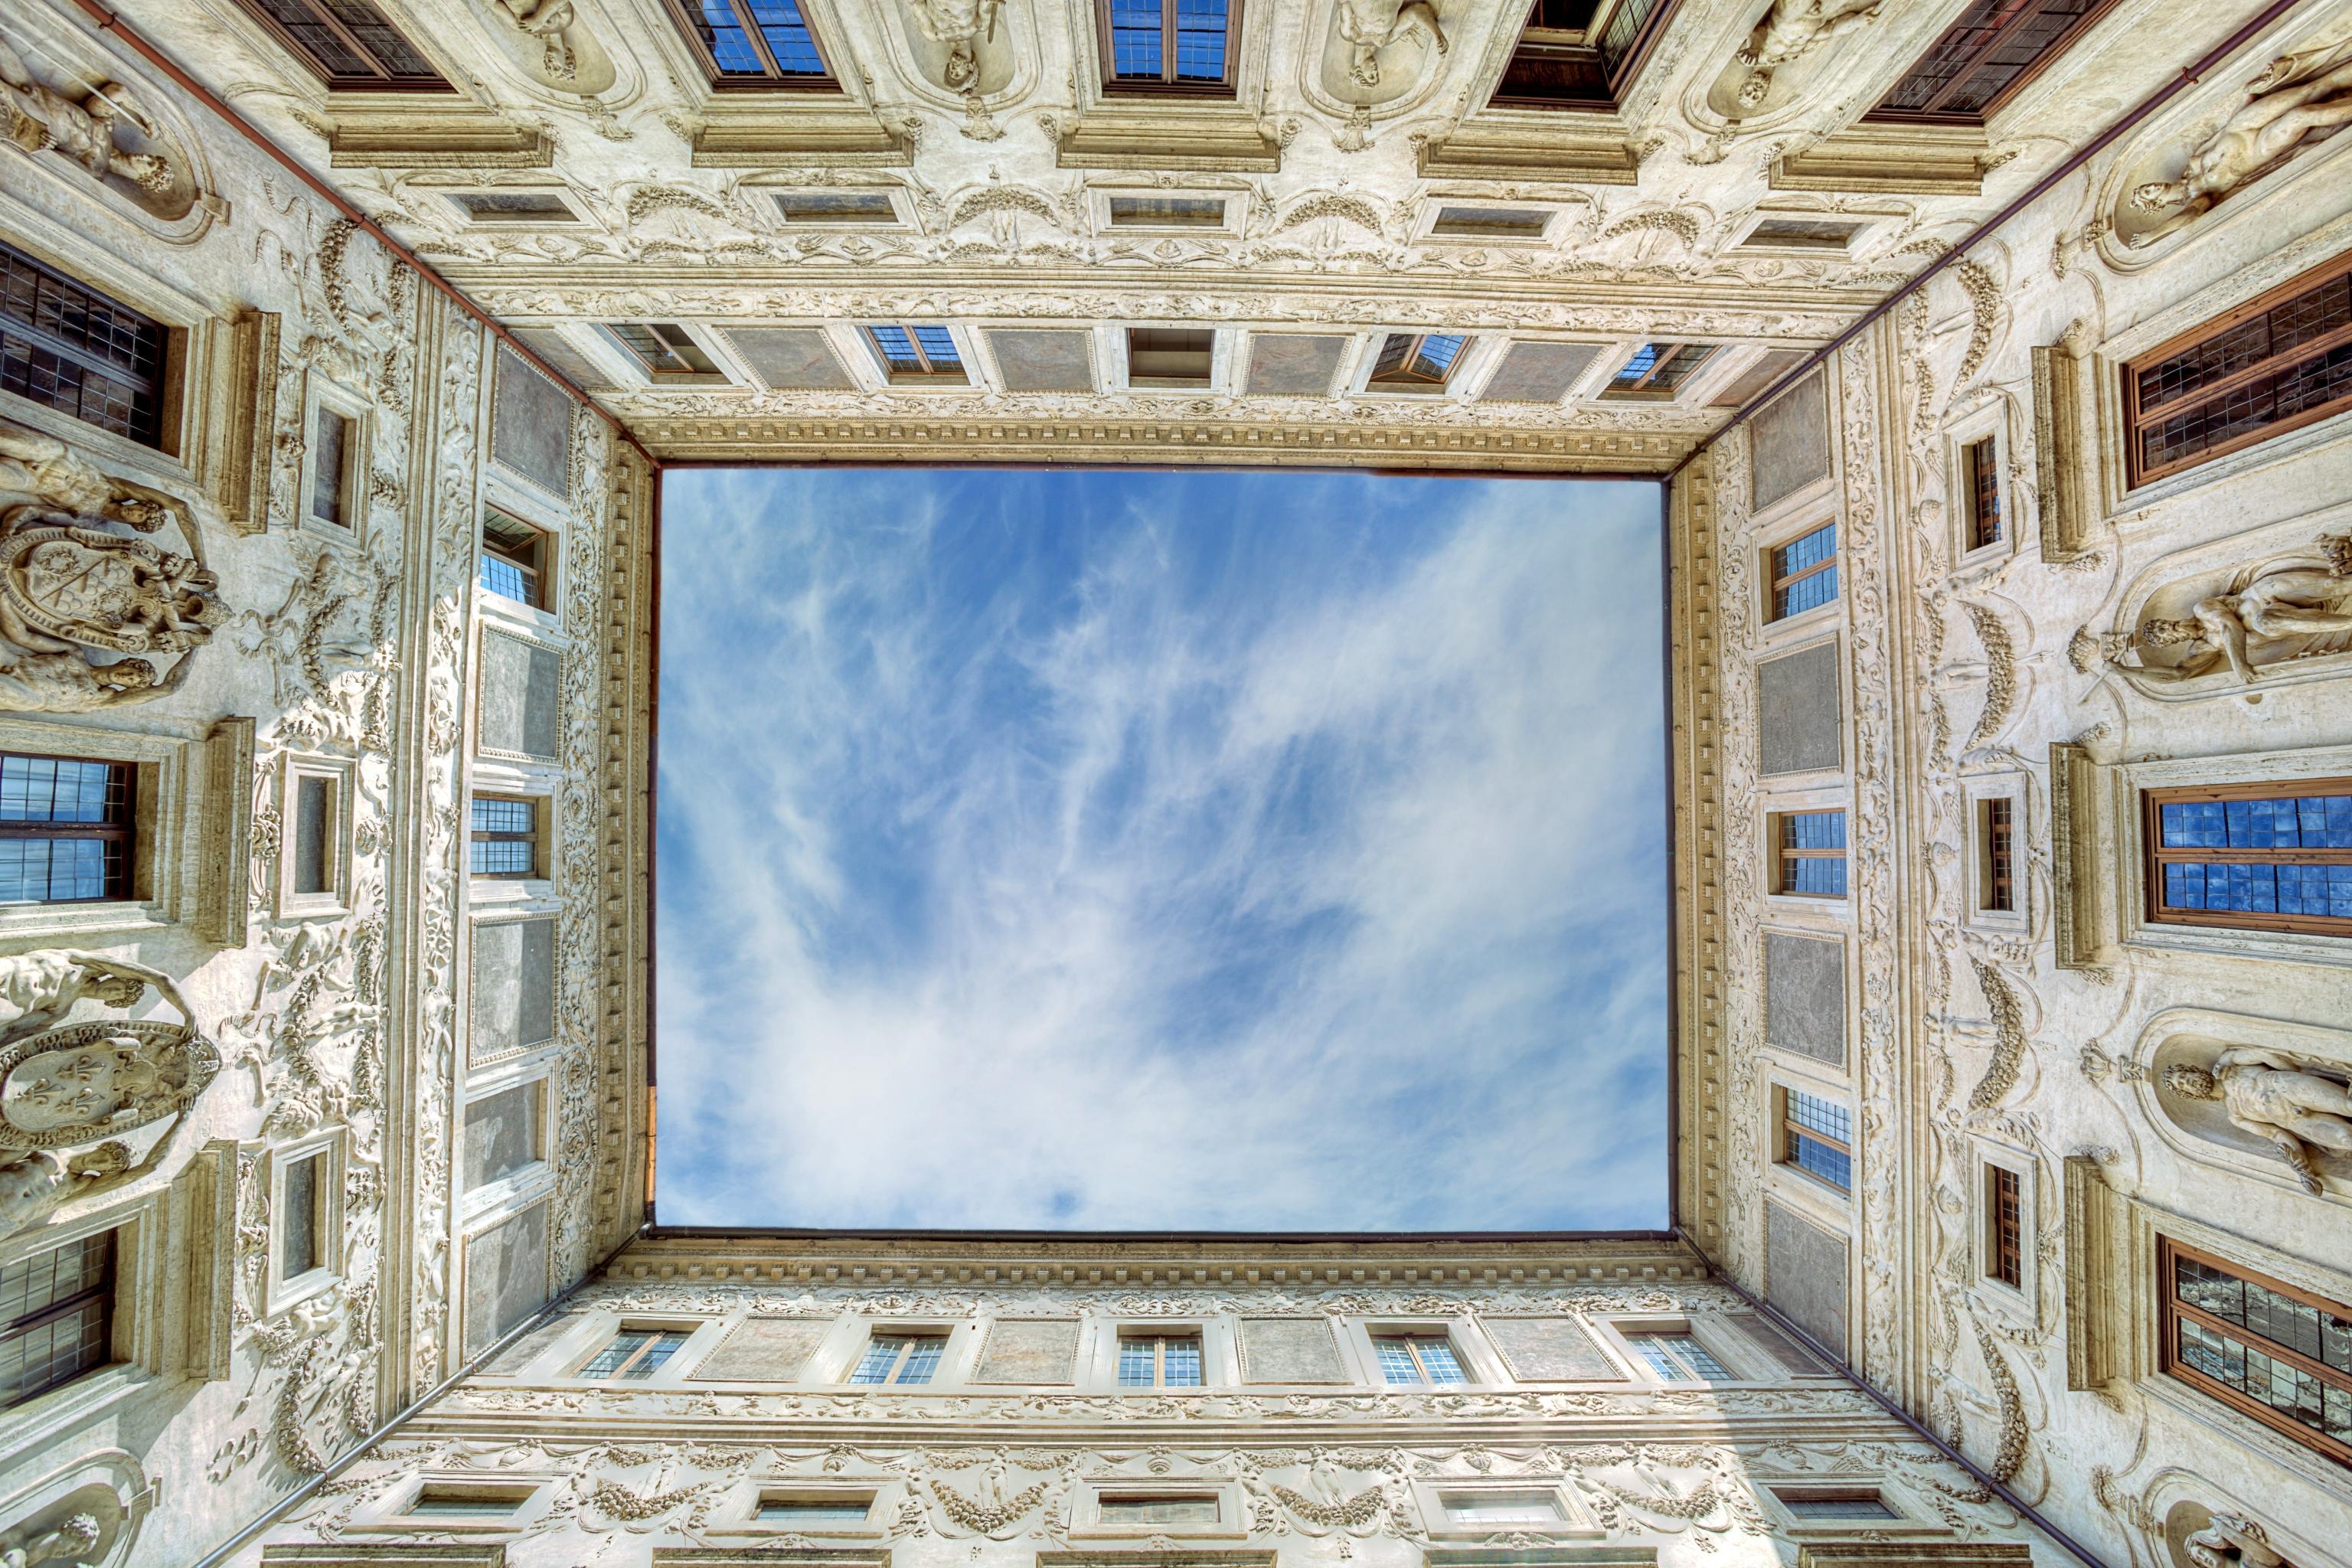 Merlino Bottega D Arte galleria spada travel guidebook –must visit attractions in